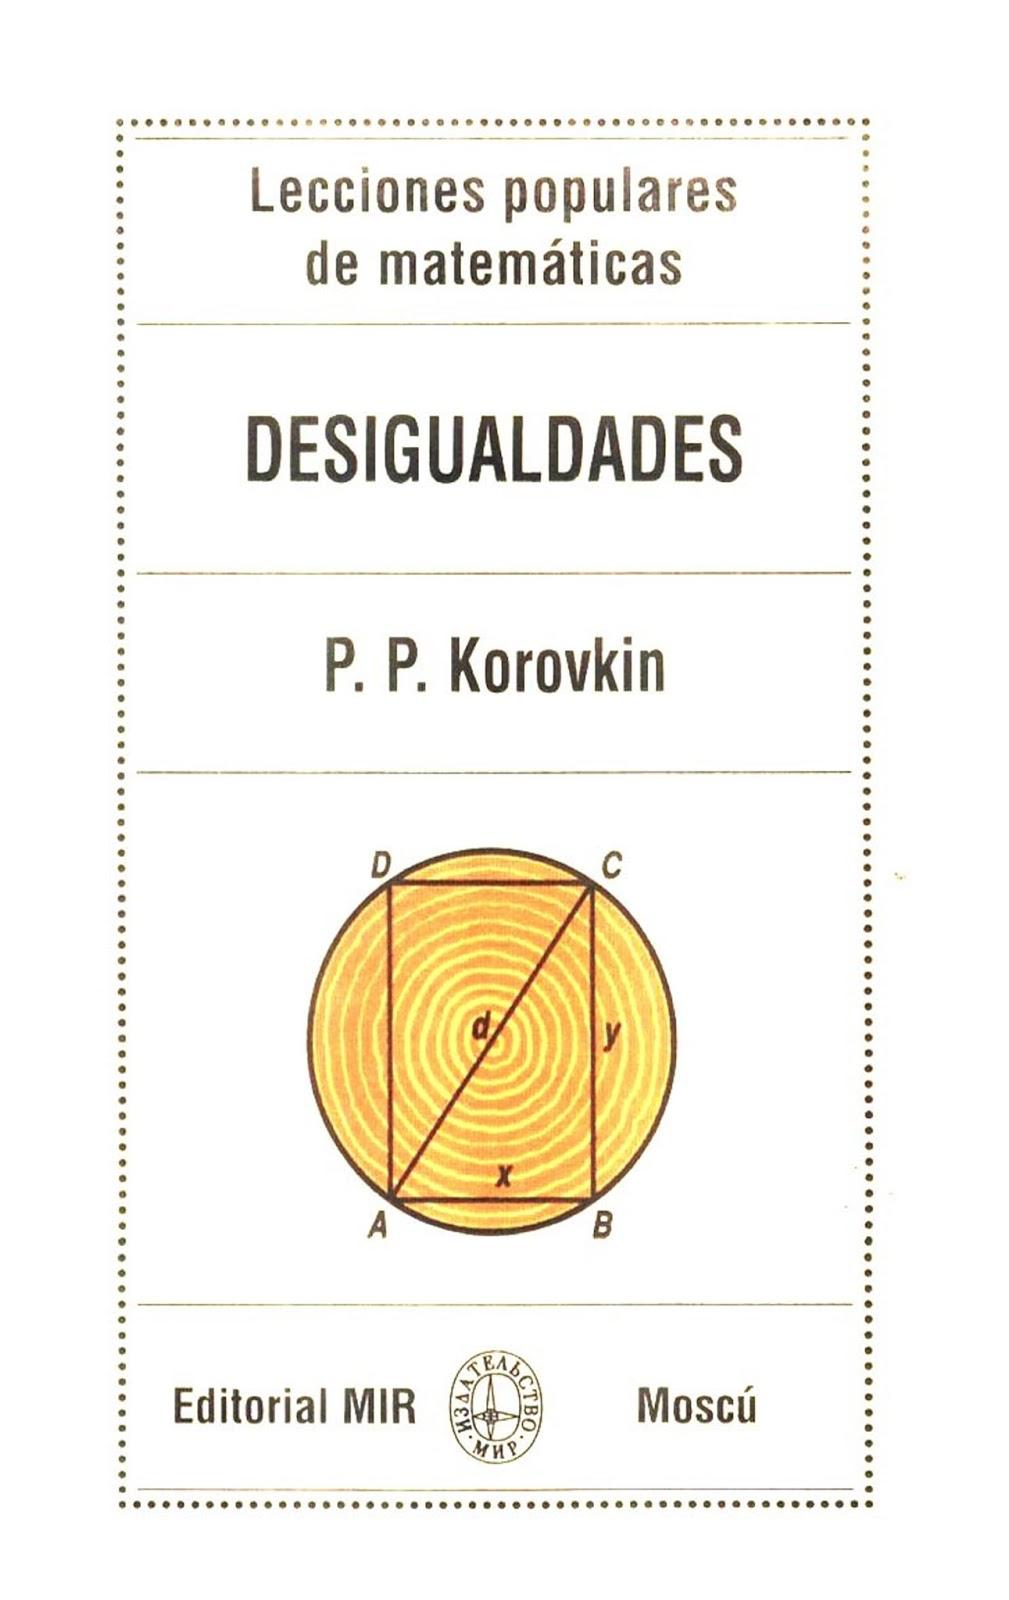 Desigualdades – P. P. Korovkin